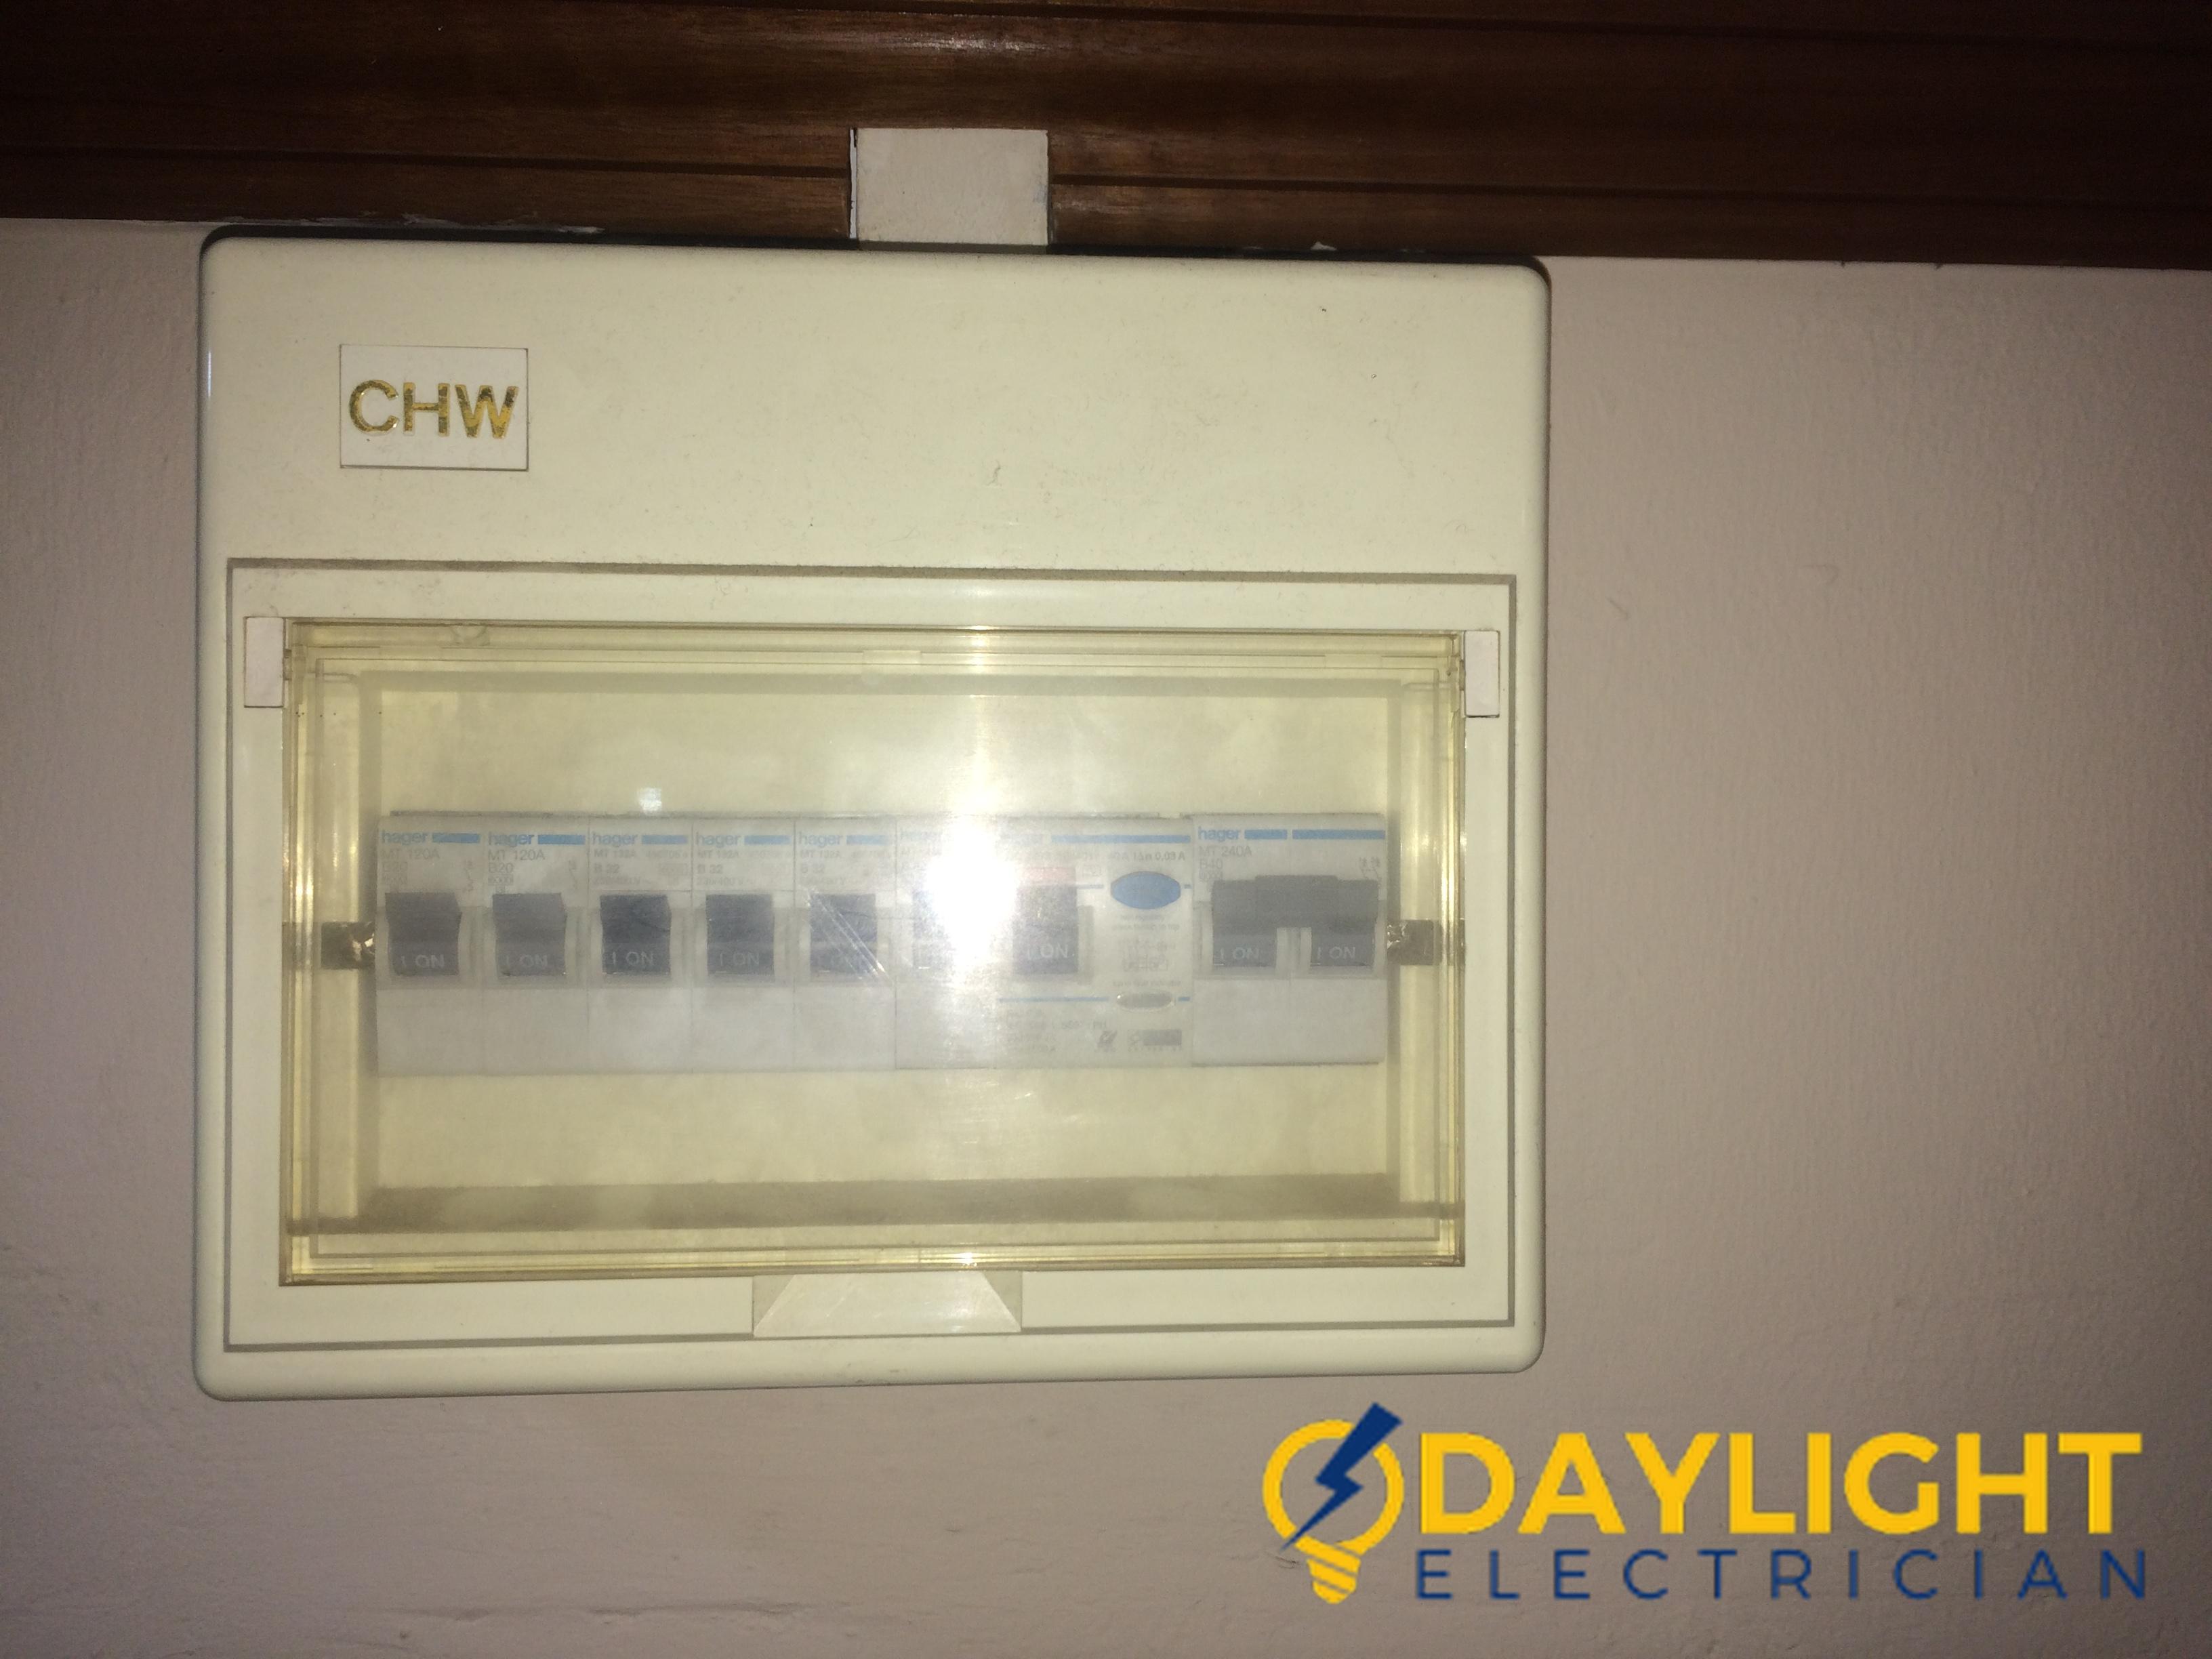 distribution-board-db-box-repair-daylight-electrician-singapore-hdb-yishun-2_wm